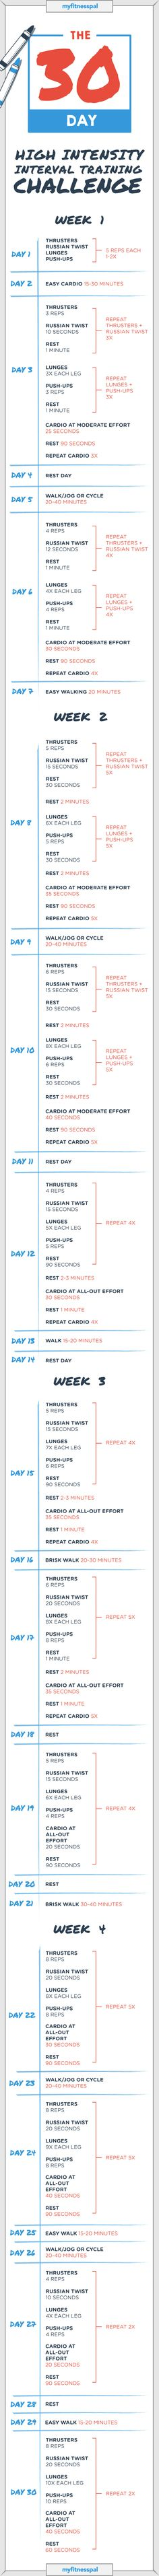 HIIT challenge training plan